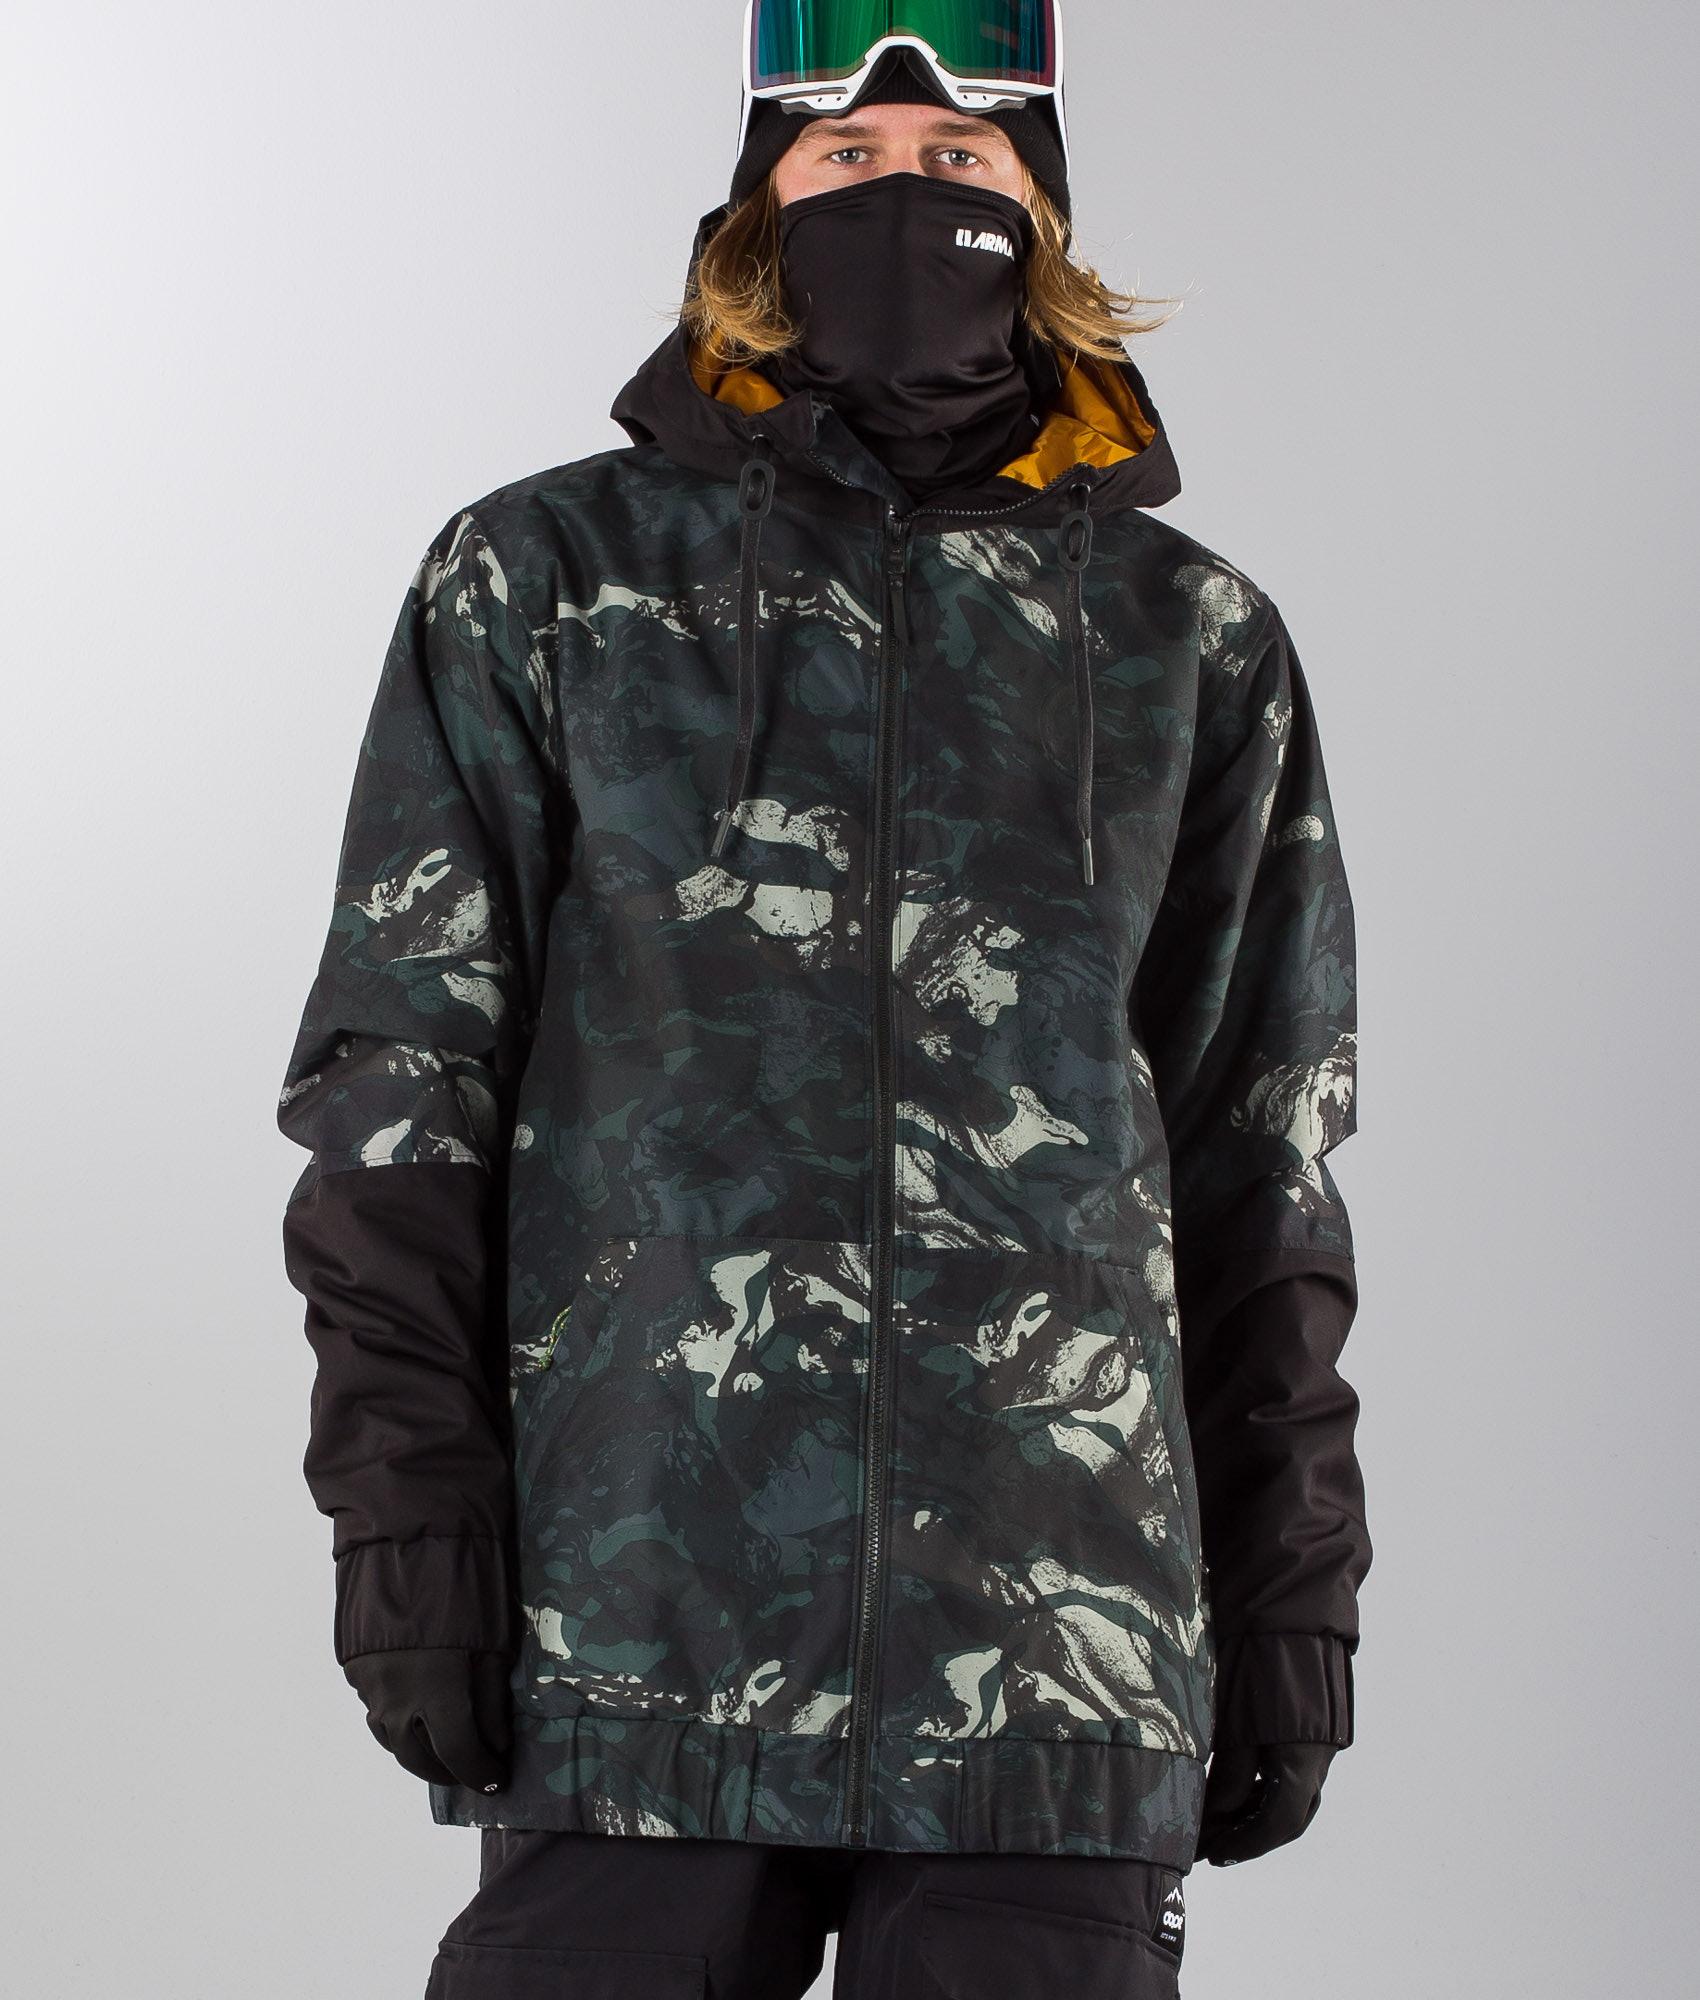 29f7ecaa74 Armada Baxter Insulated Ski Jacket Sediment - Ridestore.com